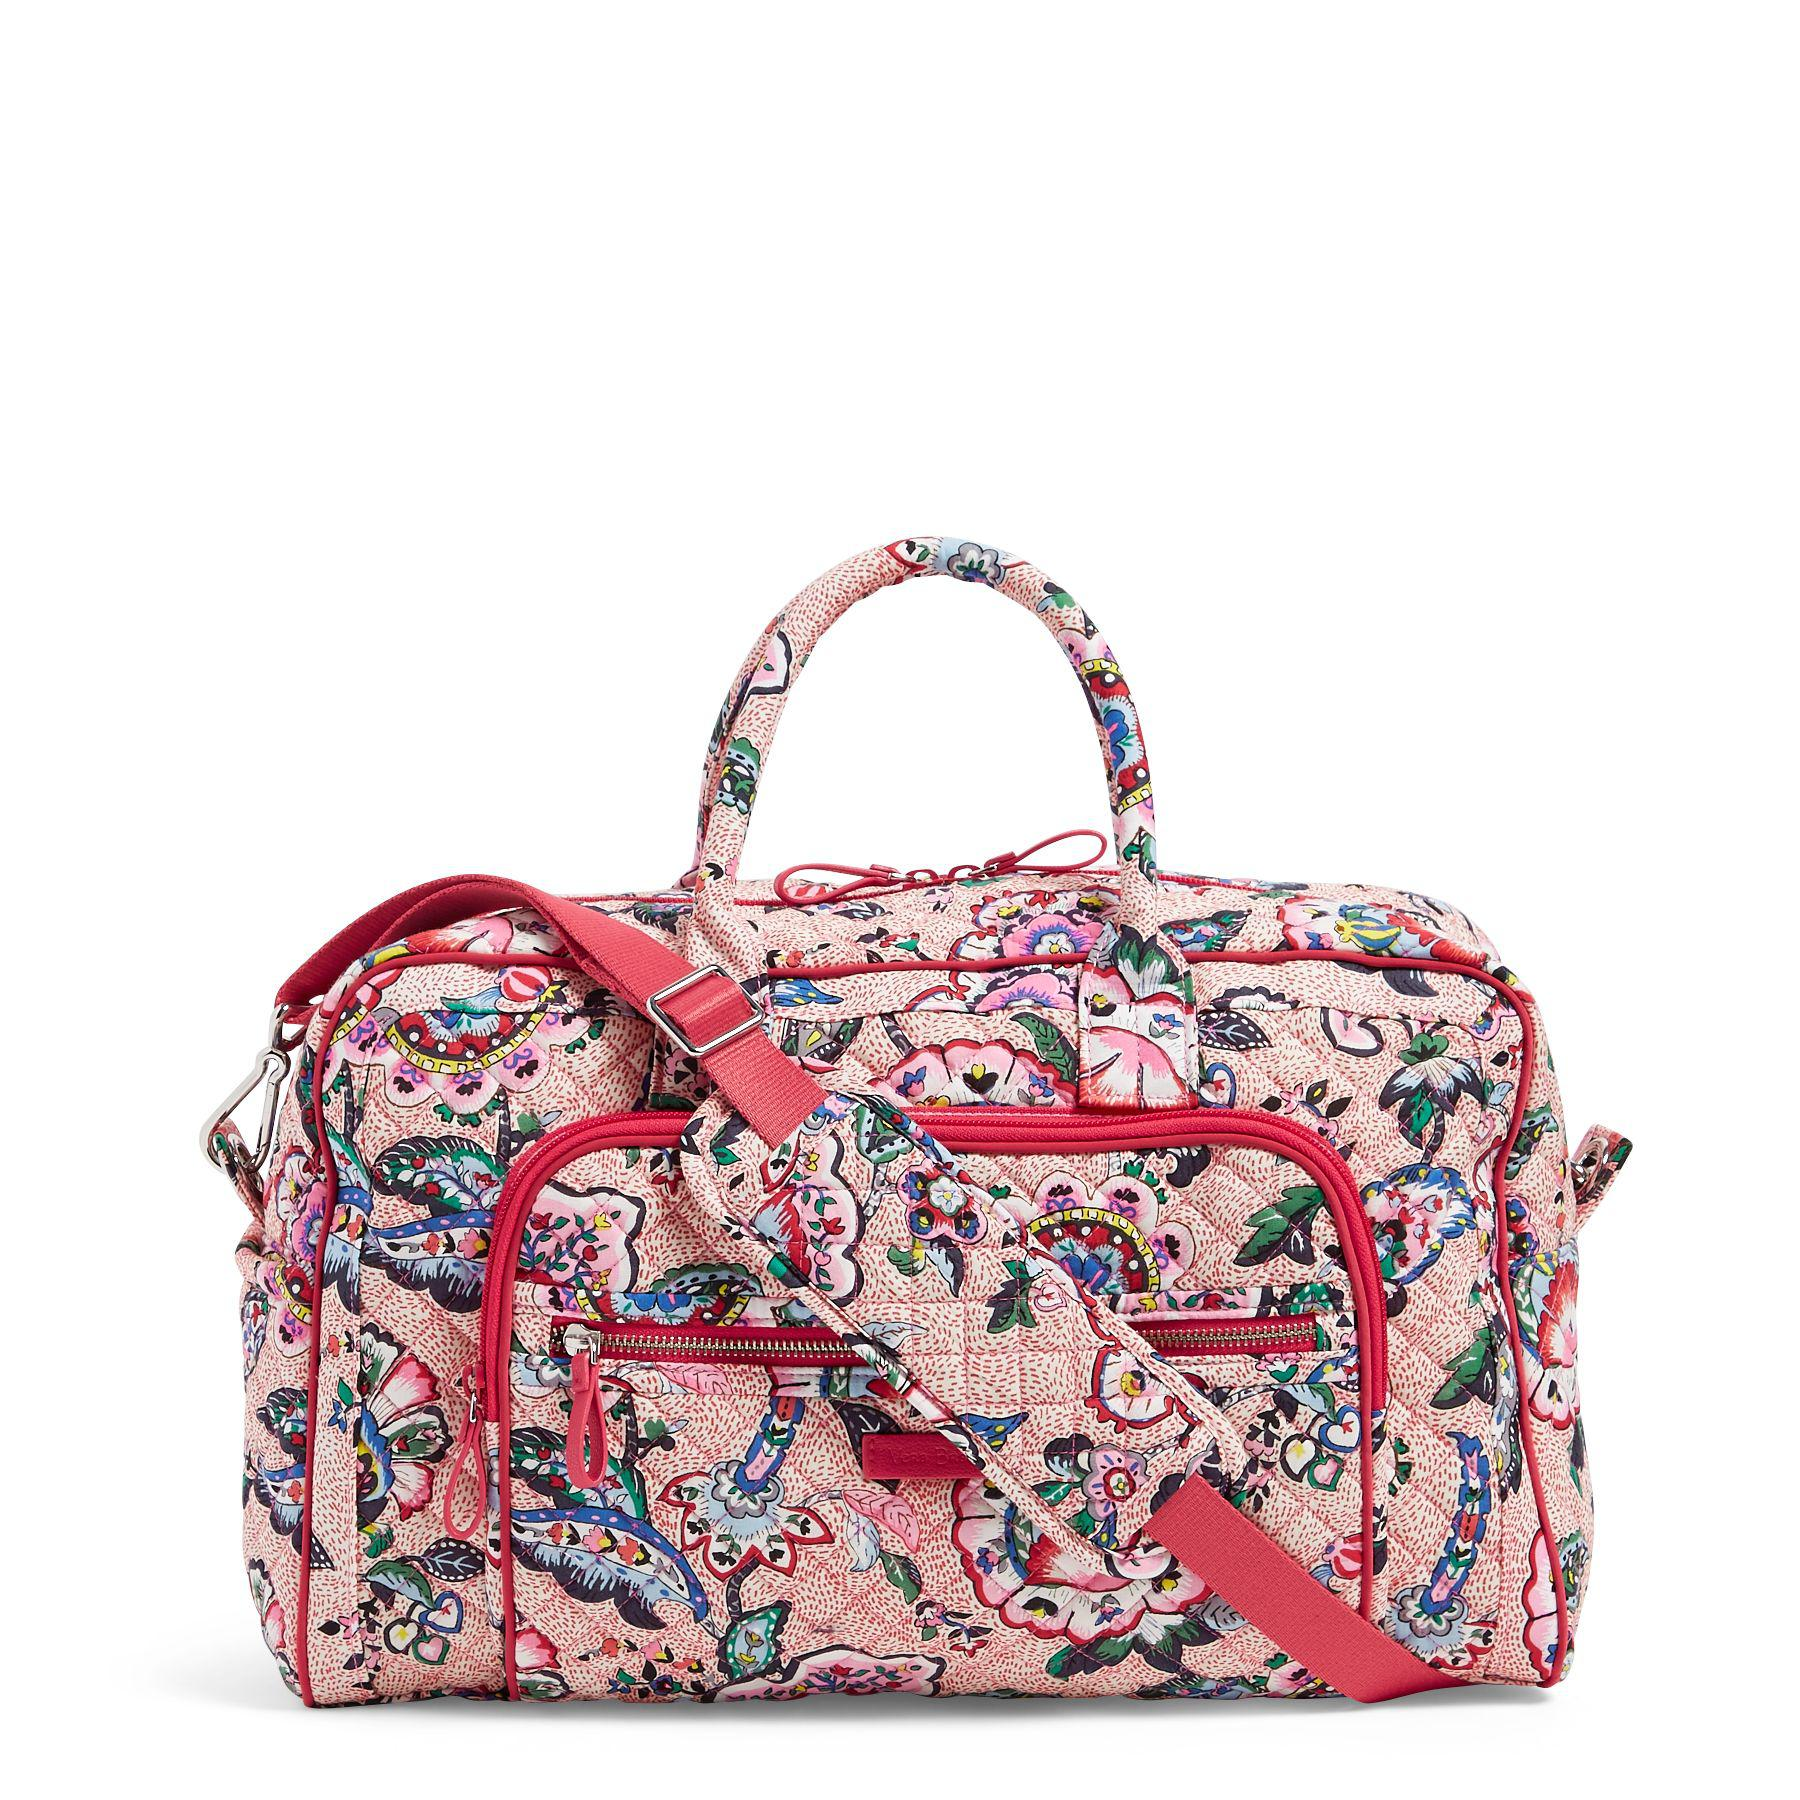 b3db470ce Vera Bradley. Women's Iconic Compact Weekender Travel Bag